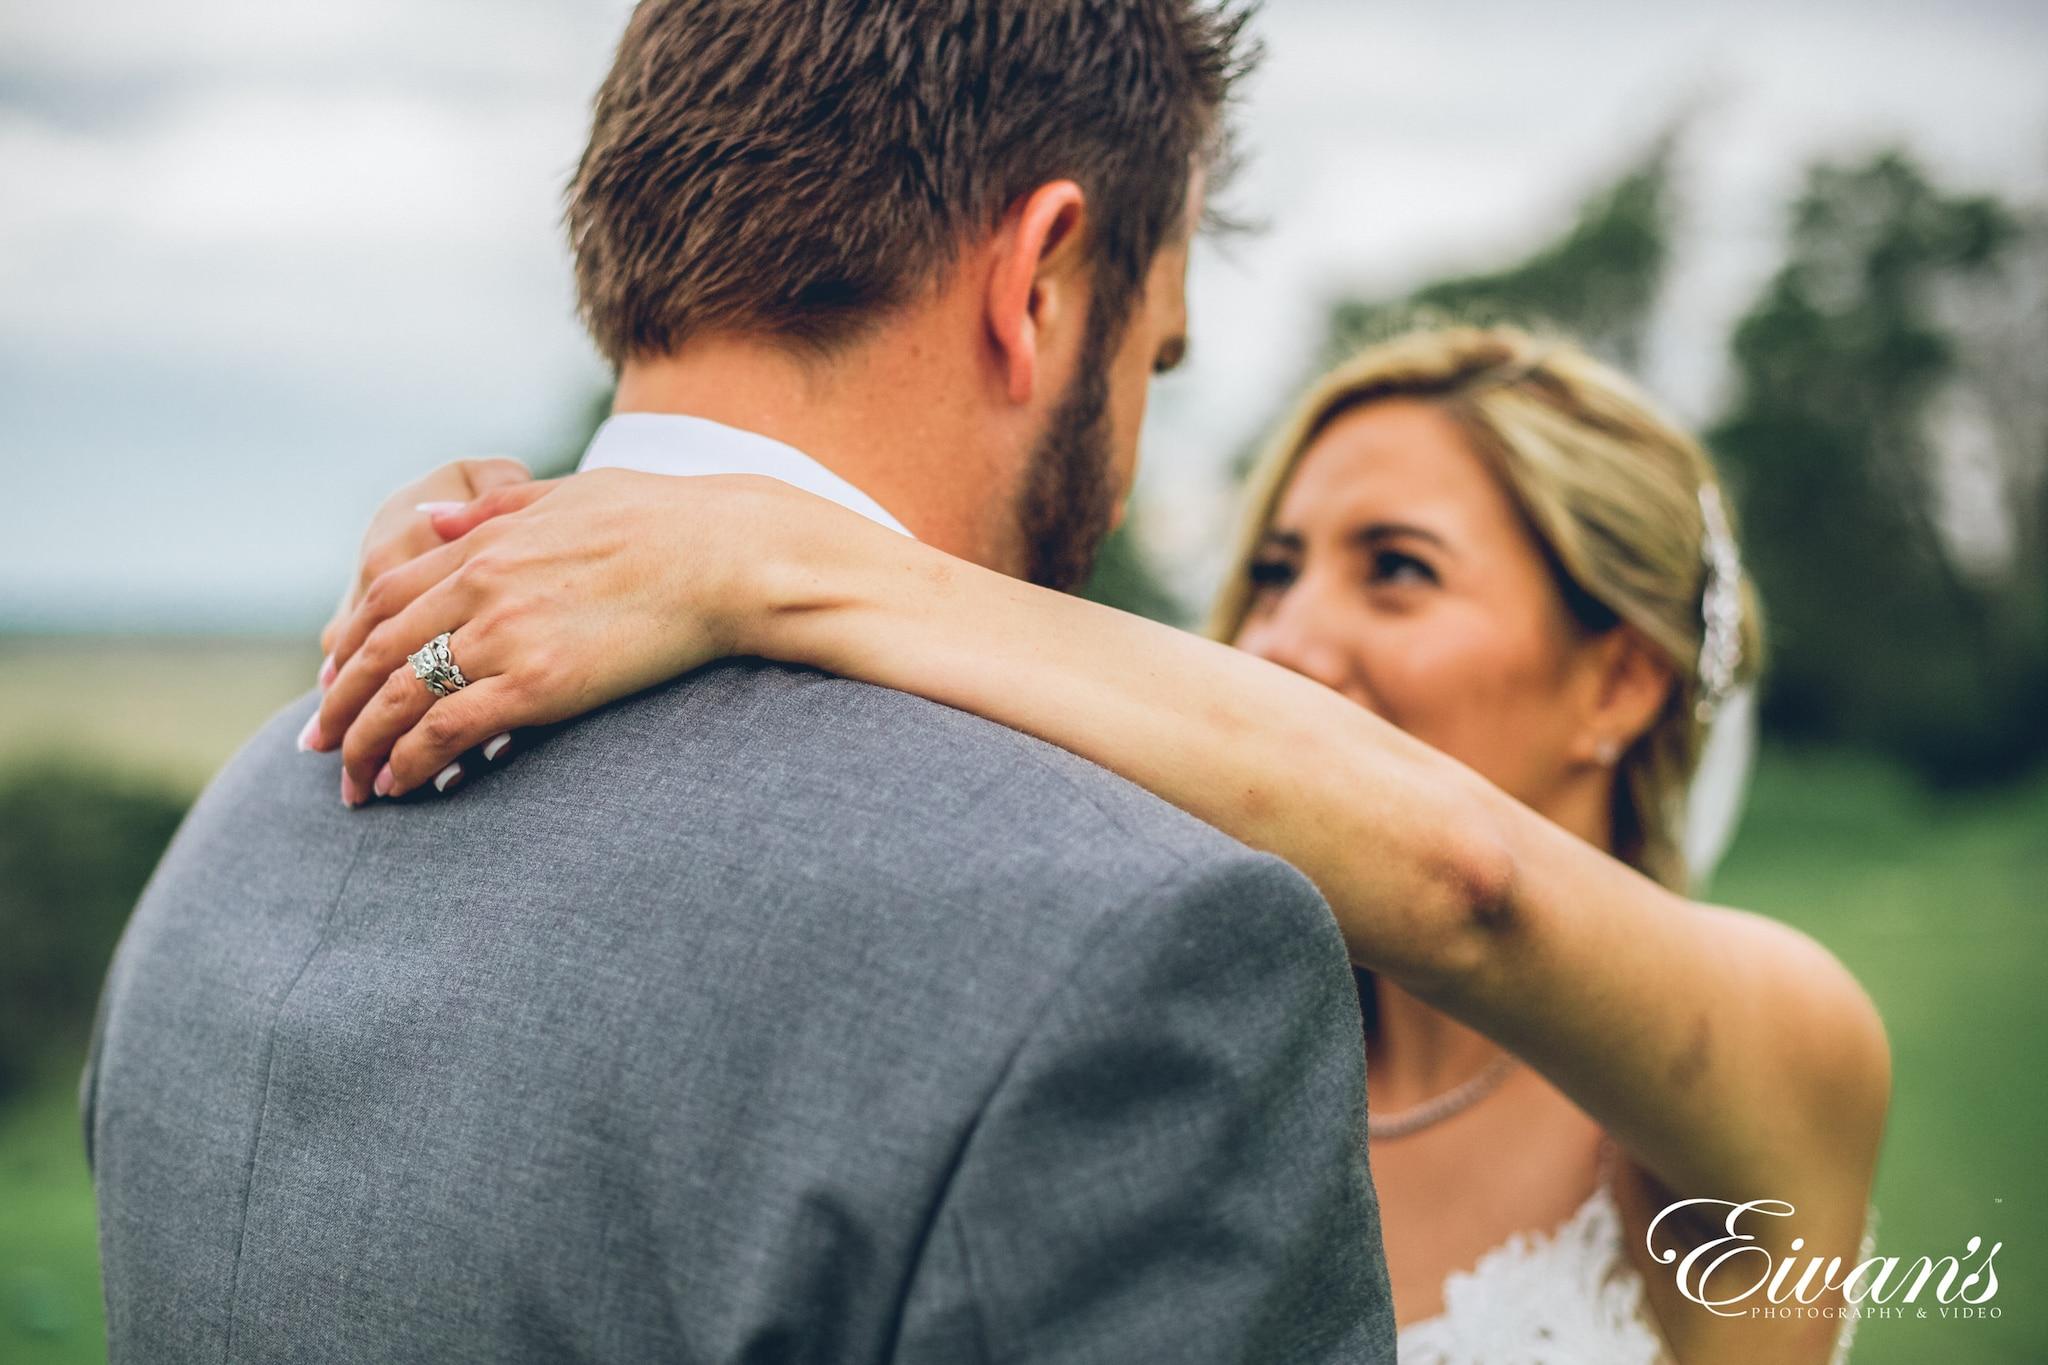 man in black suit jacket kissing woman in white dress